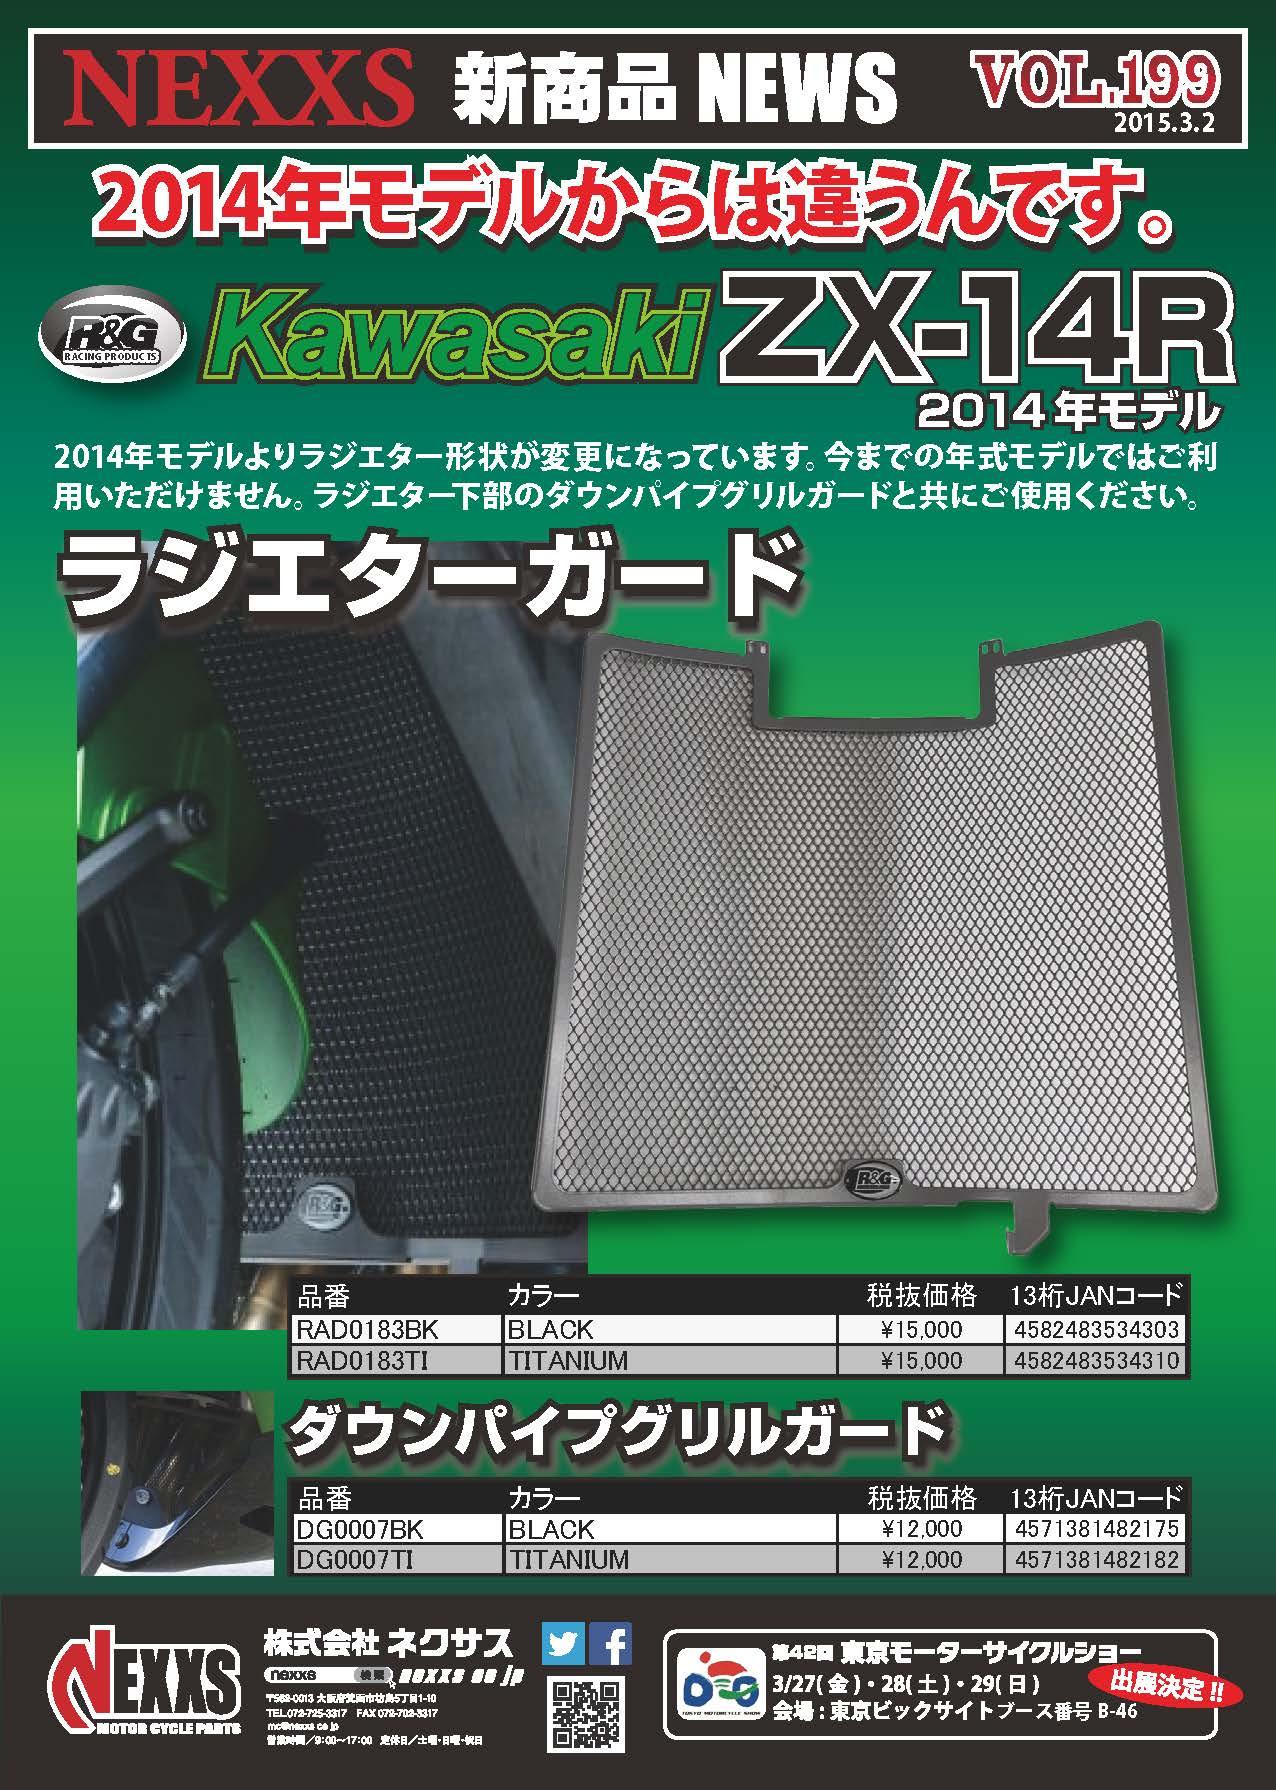 R Amp Gレーシングプロダクツ Zx 14r 2014 ラジエターガード新発売! Nexxs Japan